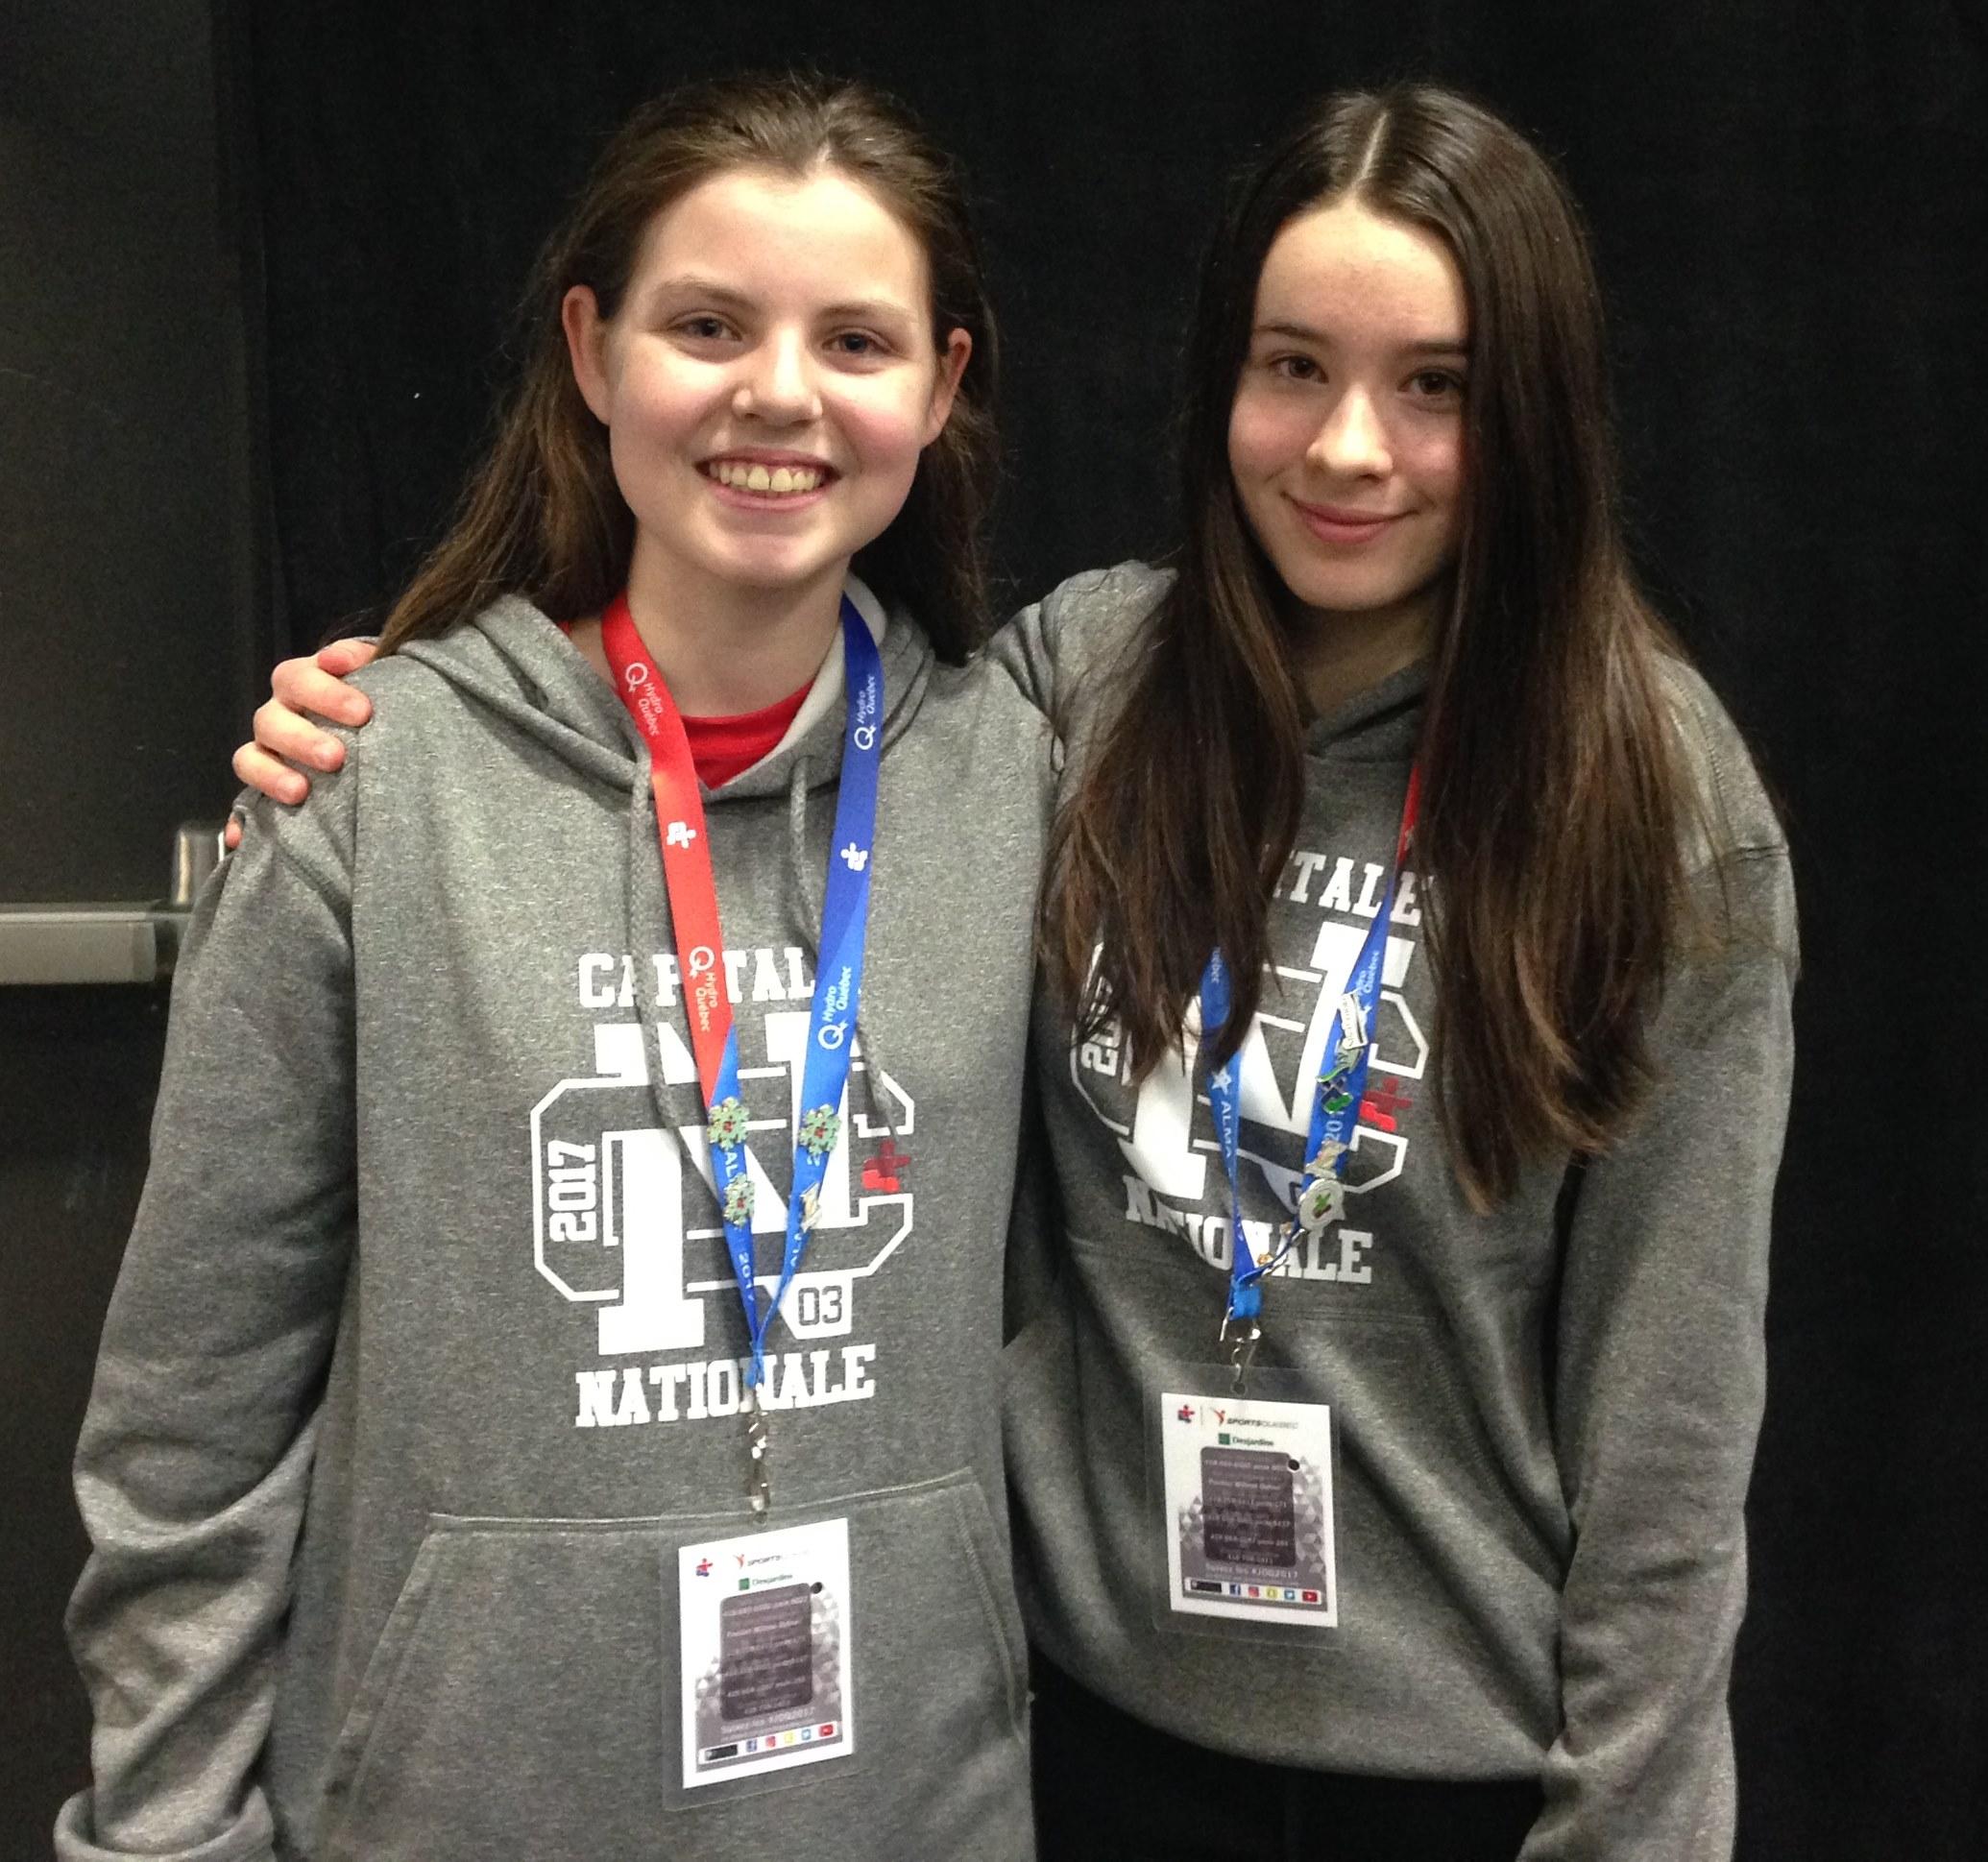 2017-02-26 Estelle Tremblay et Maryanne Bouchard